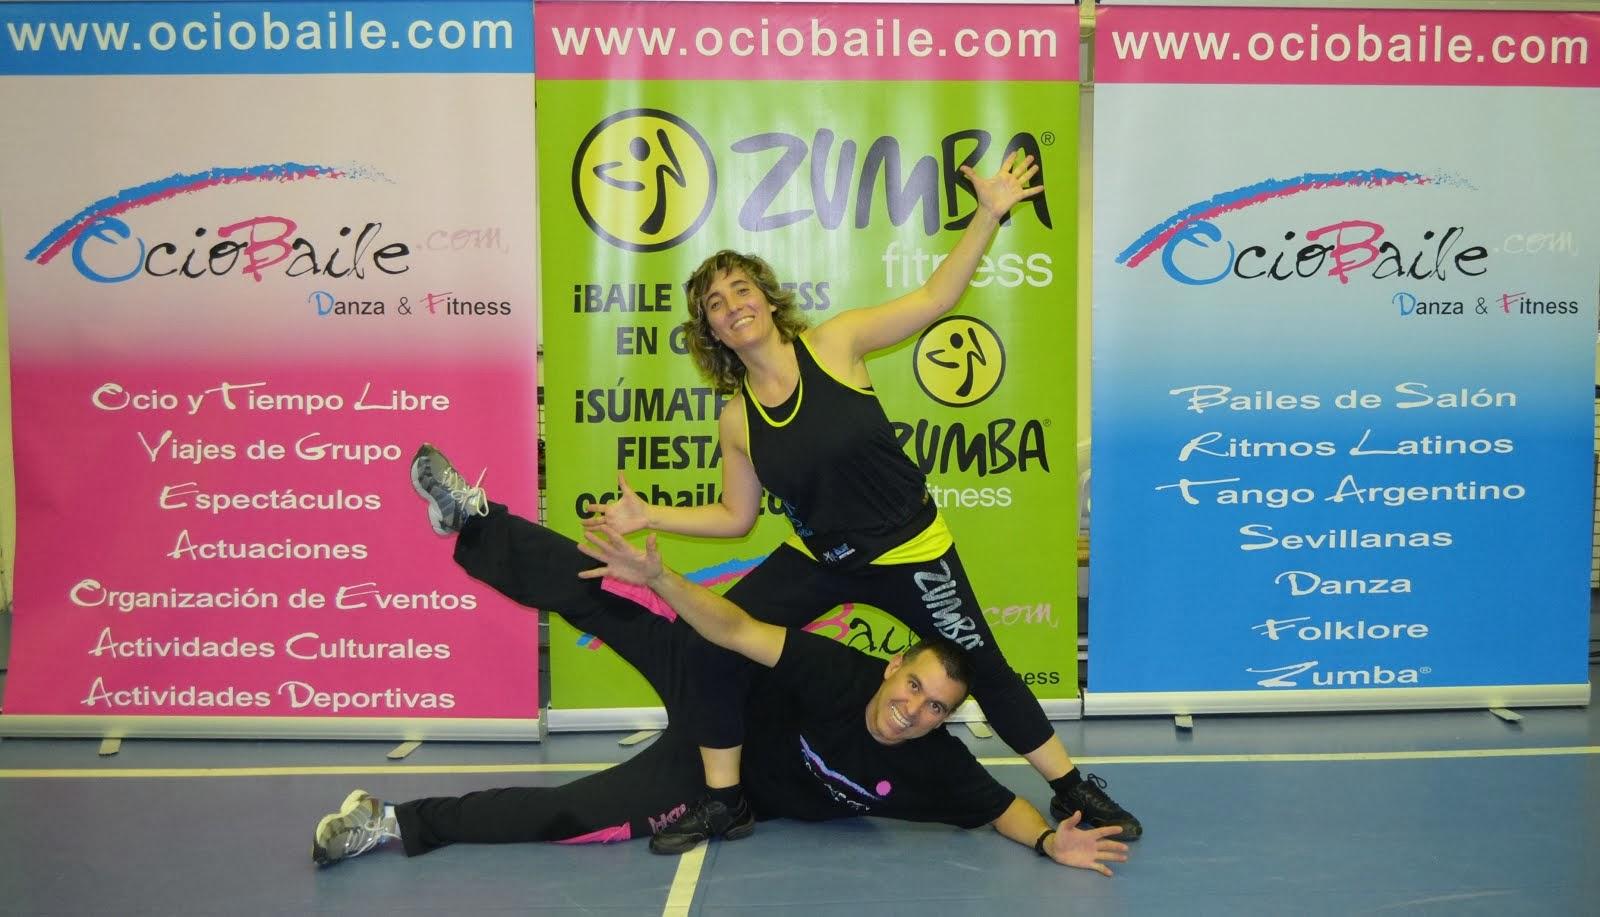 Zumba® Segovia Ociobaile